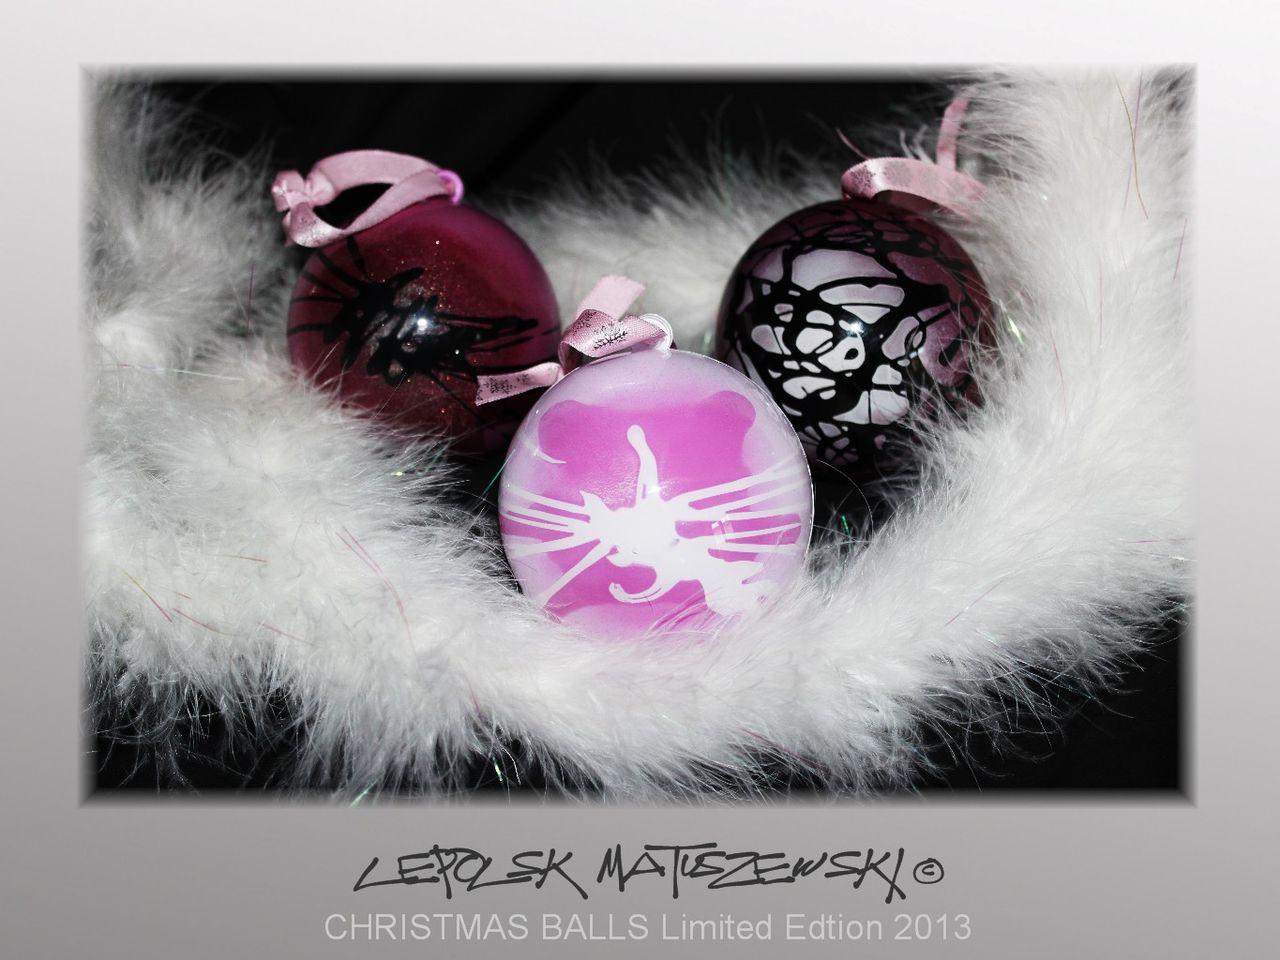 MK  Lepolsk Matuszewski PINK BALLS  Christmas Balls by Lepolsk Matuszewski Limited Edition ©2013